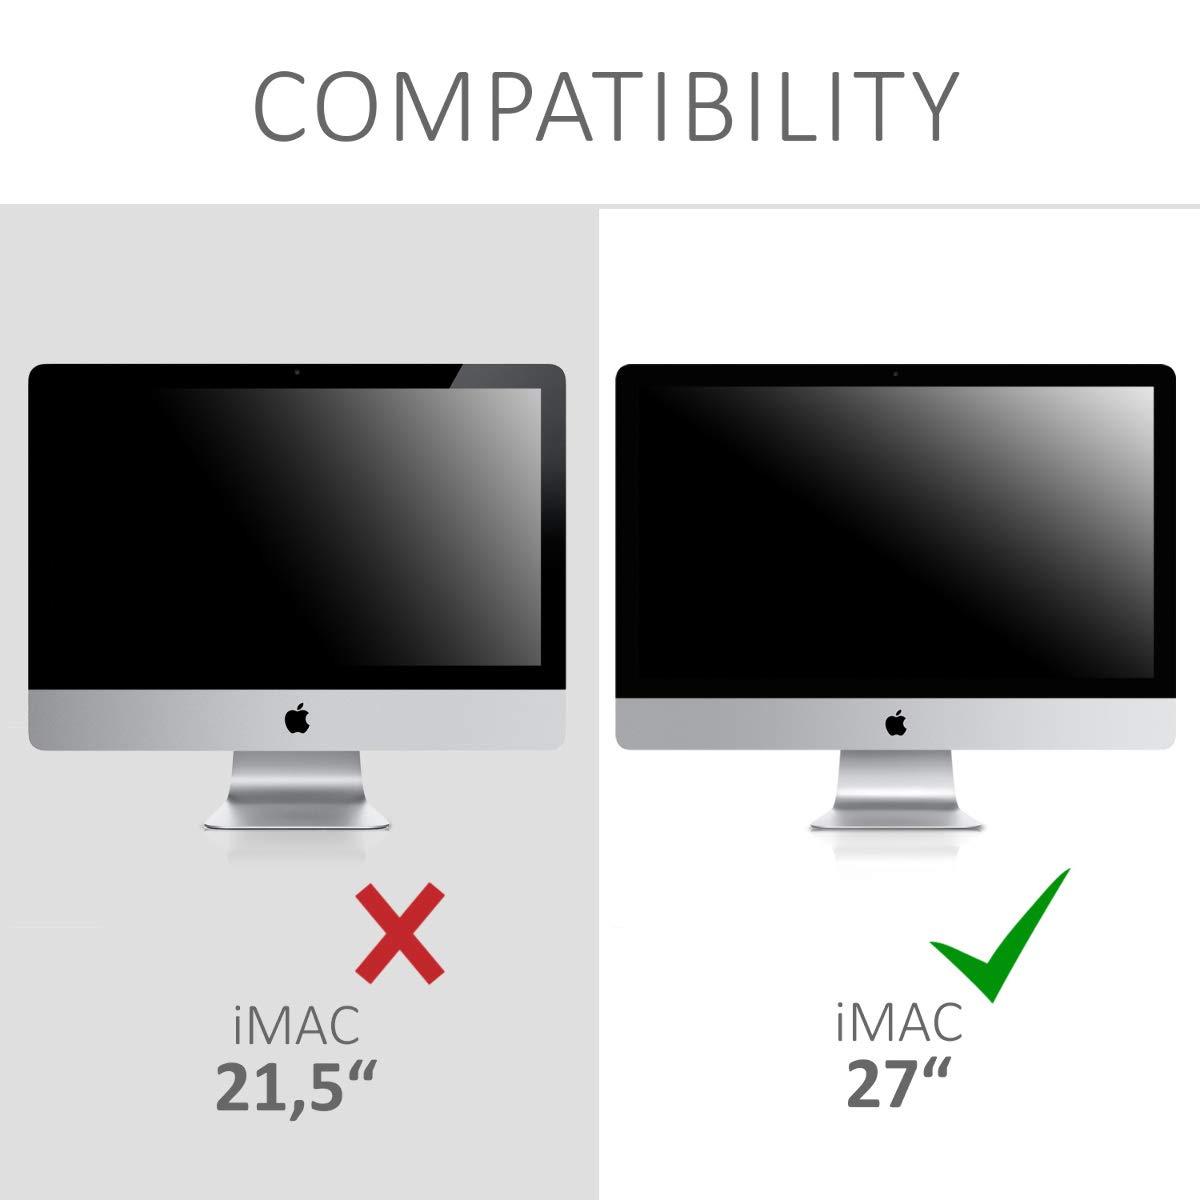 PC Bildschirm Schutzh/ülle f/ür Apple iMac 27 kwmobile Apple iMac 27 Computer Cover Case iMac Pro 27 iMac Pro 27 H/ülle